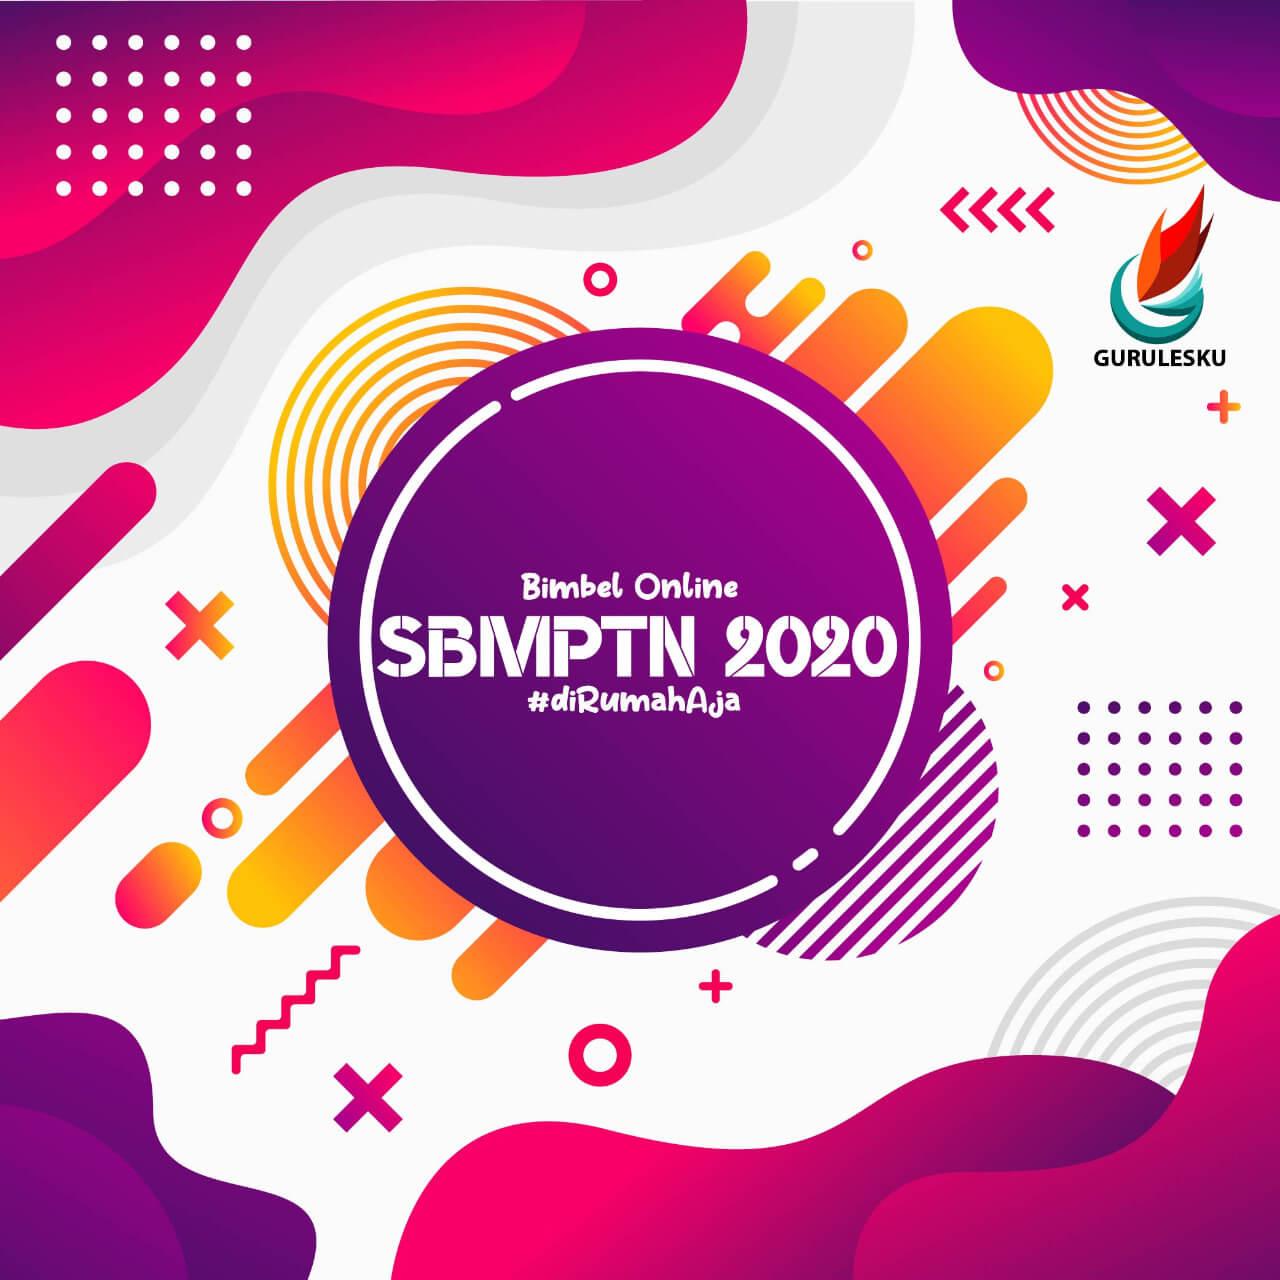 Bimbel Online SBMPTN Surabaya 2020